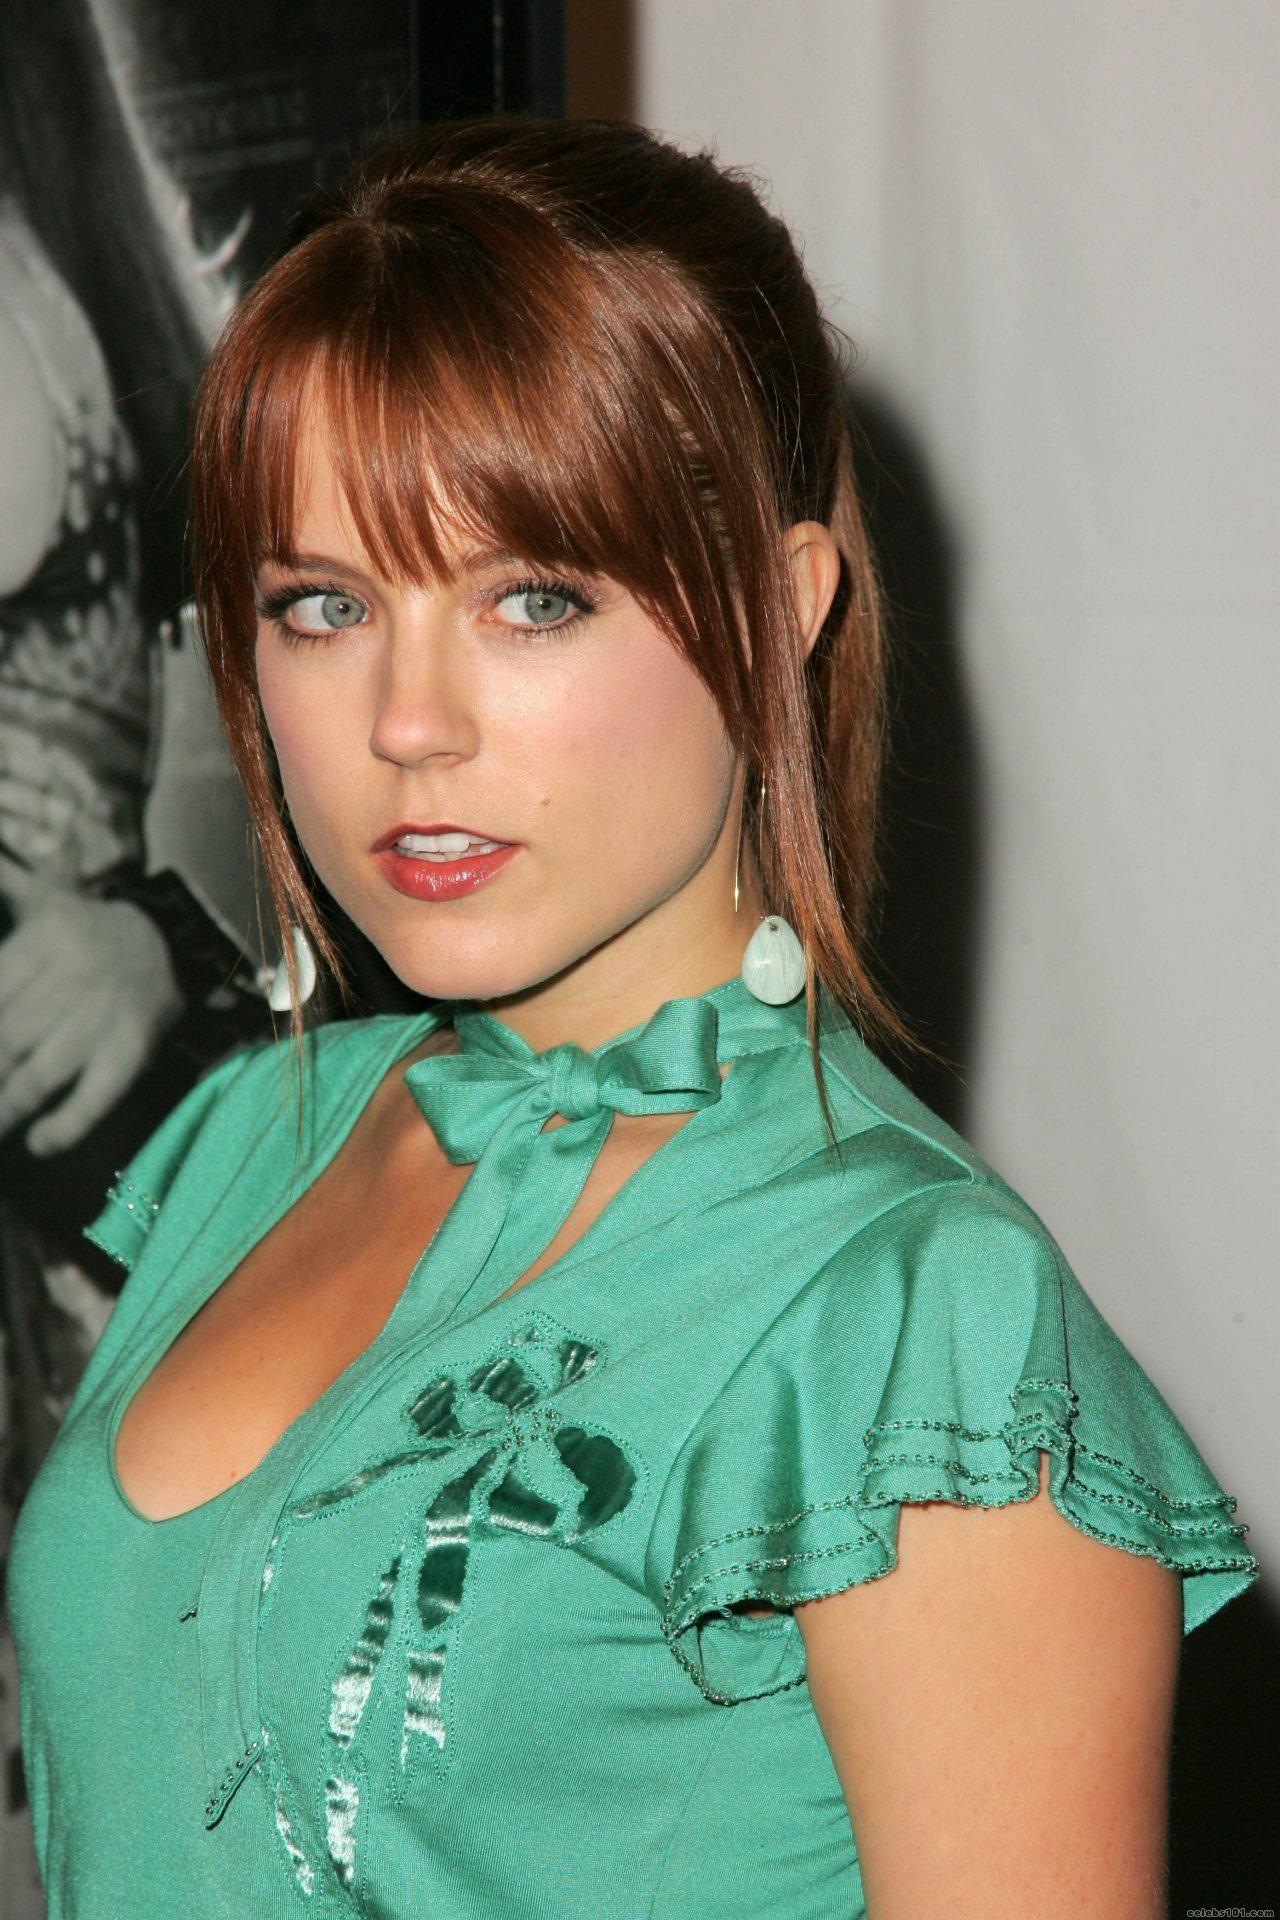 100 Images of Allison Munn Hot